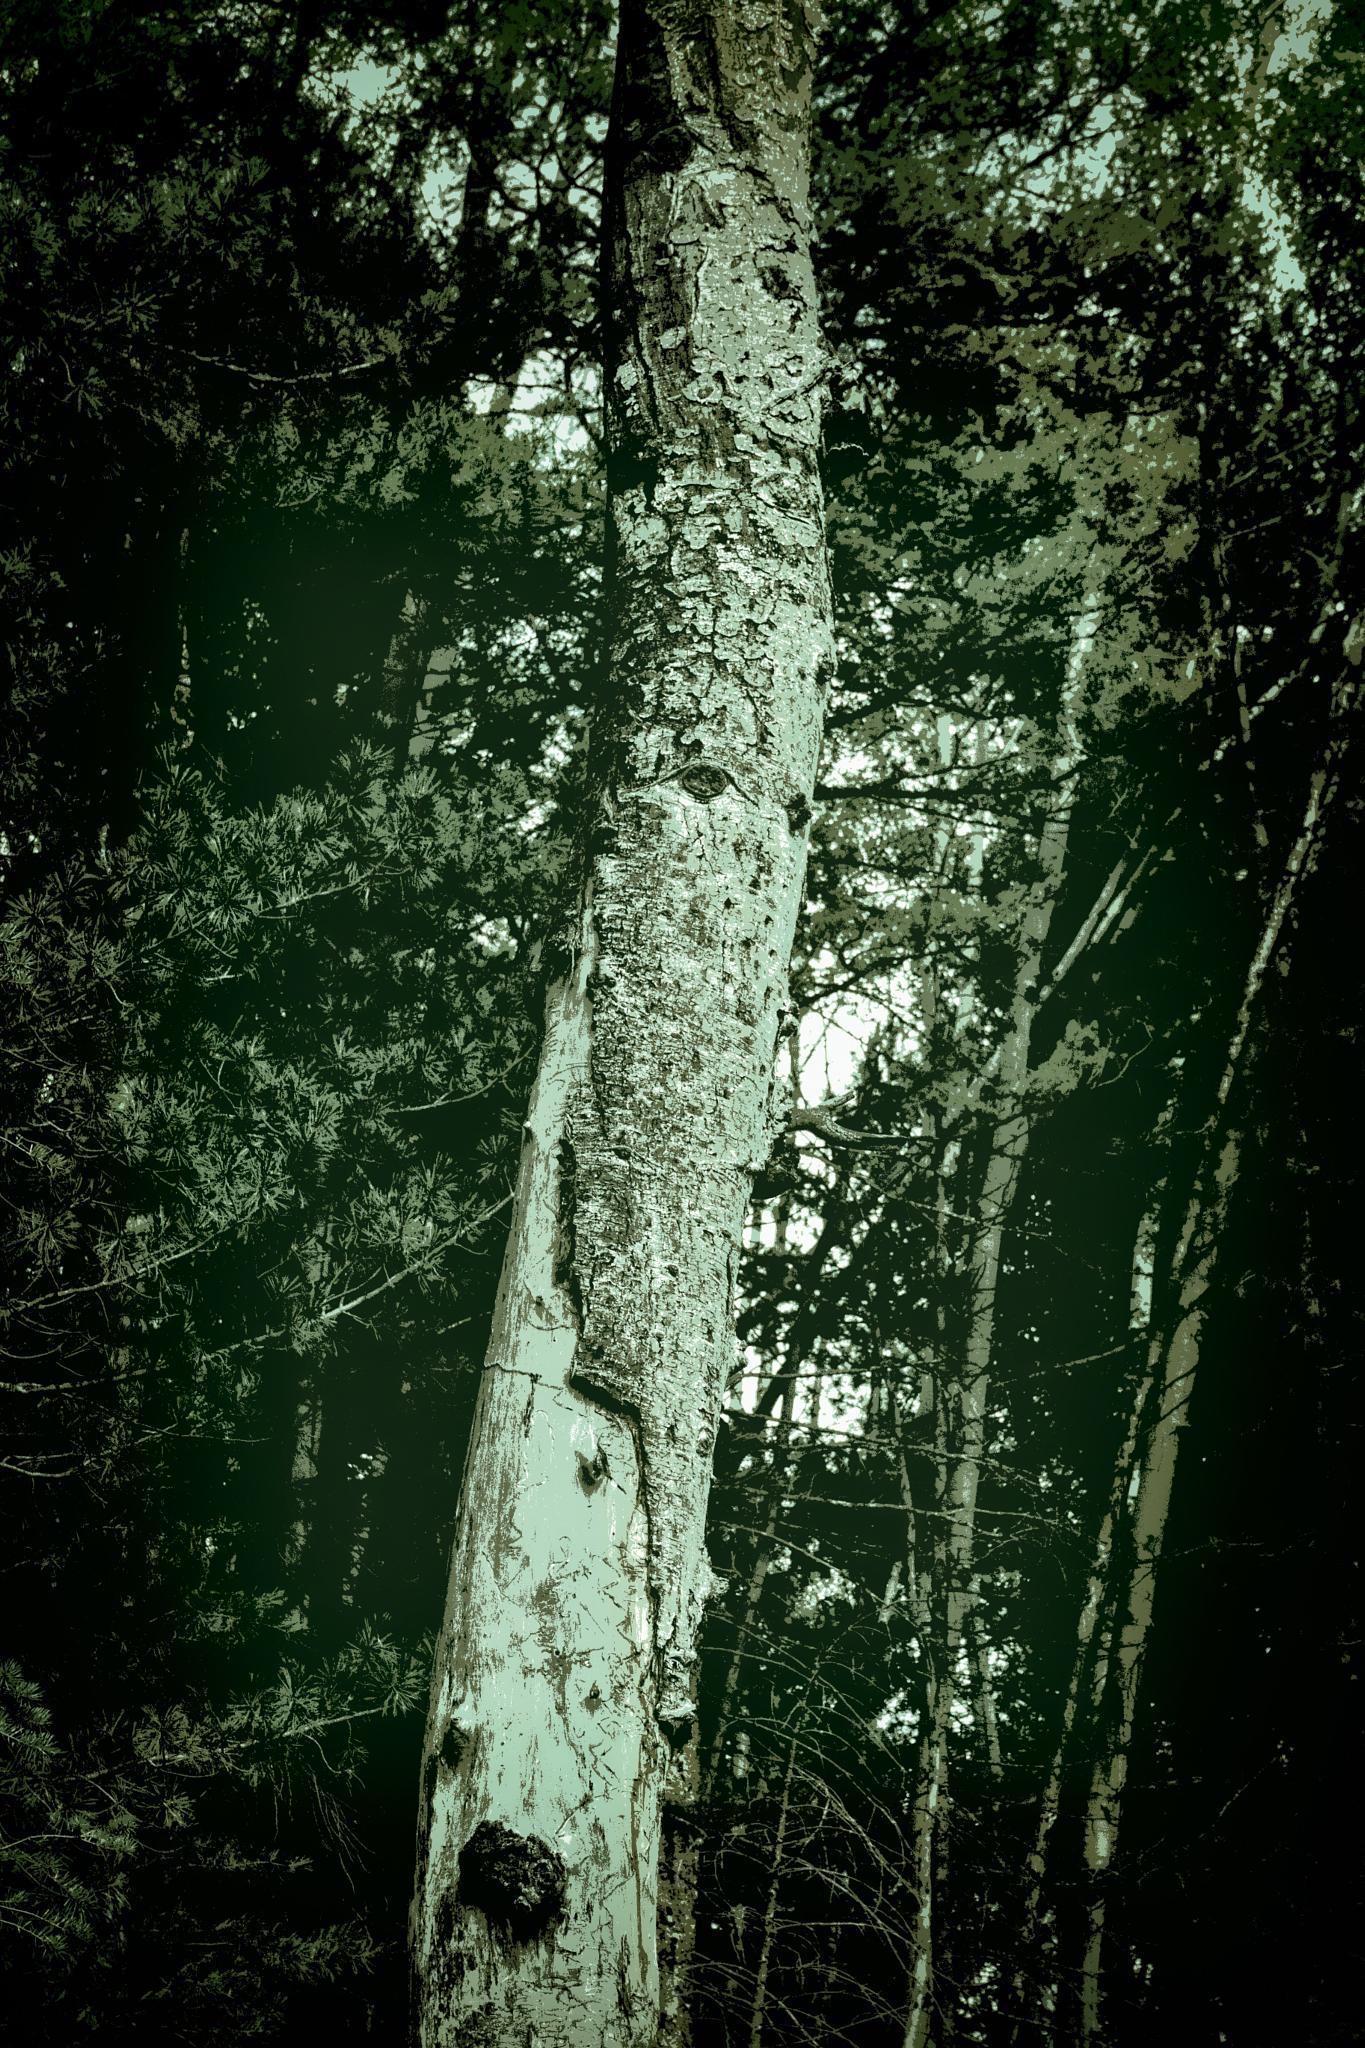 Maimed in the Forest by John Mark Jennings